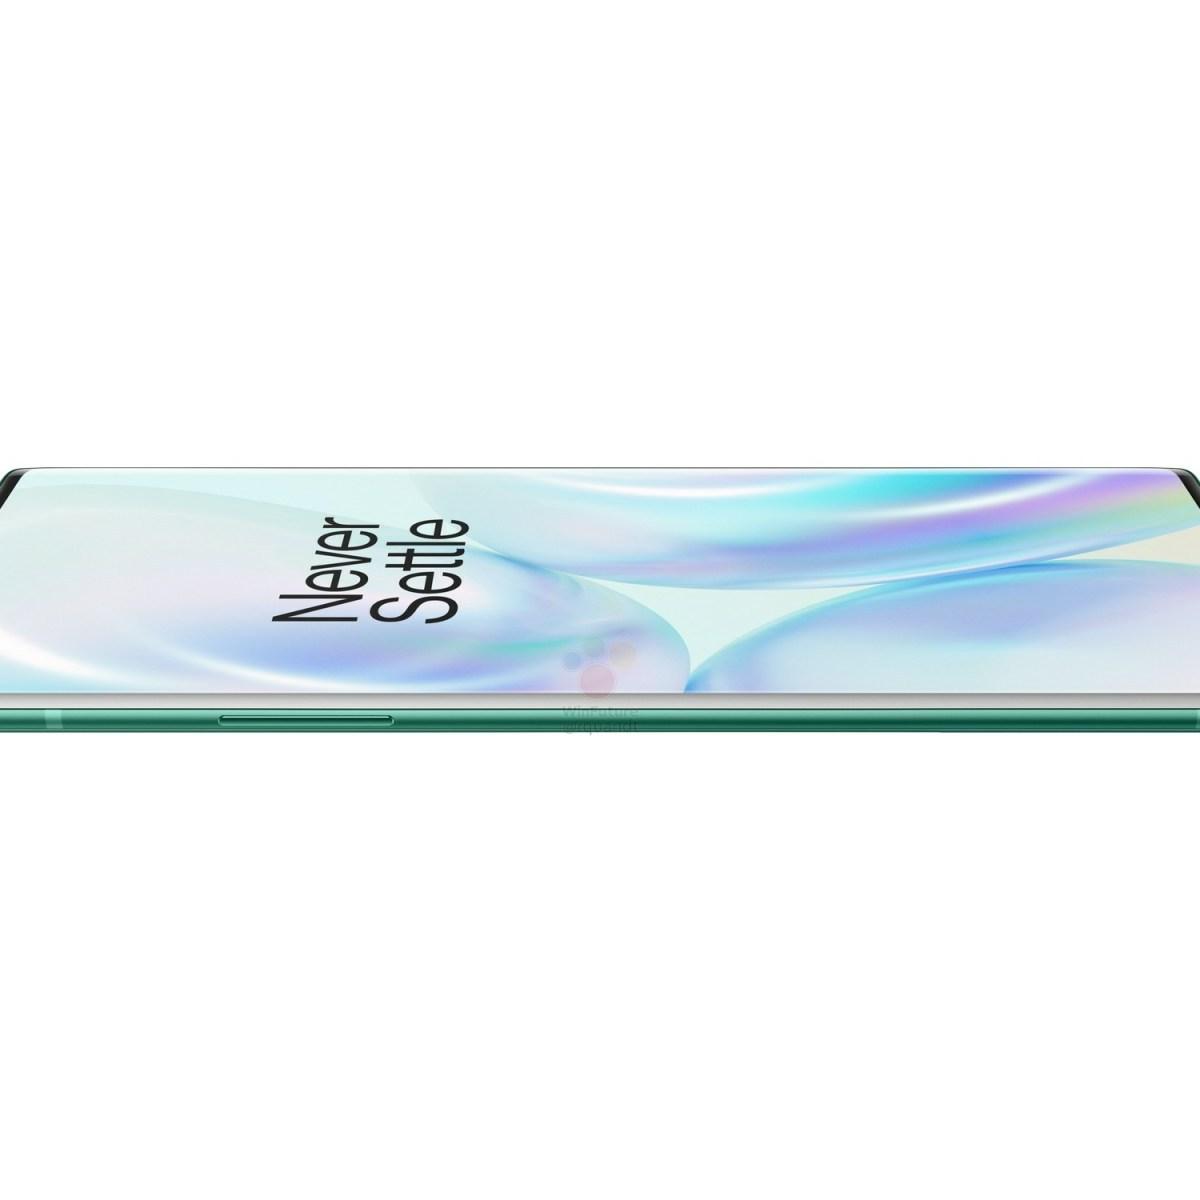 OnePlus 8 Pro Glacier Green